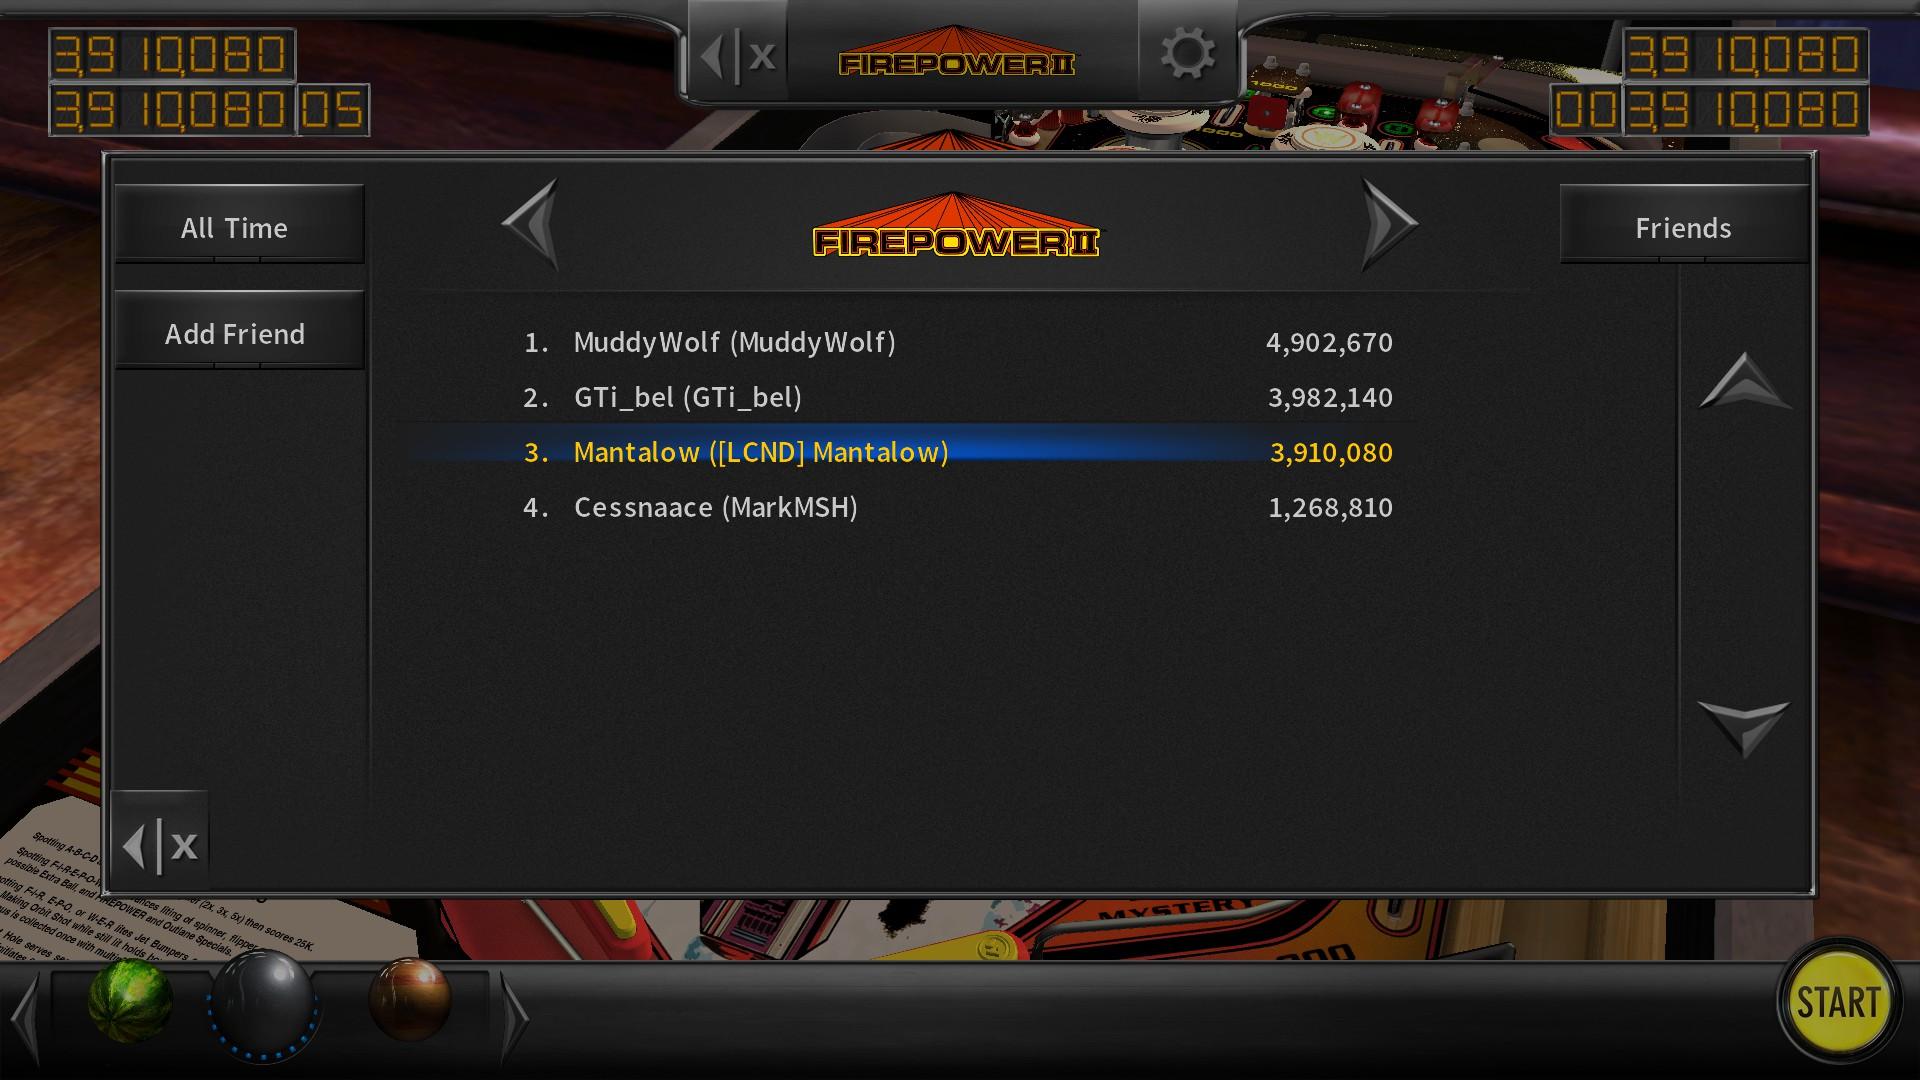 Mantalow: Pinball Arcade: Firepower II (PC) 3,910,080 points on 2018-02-28 02:58:34